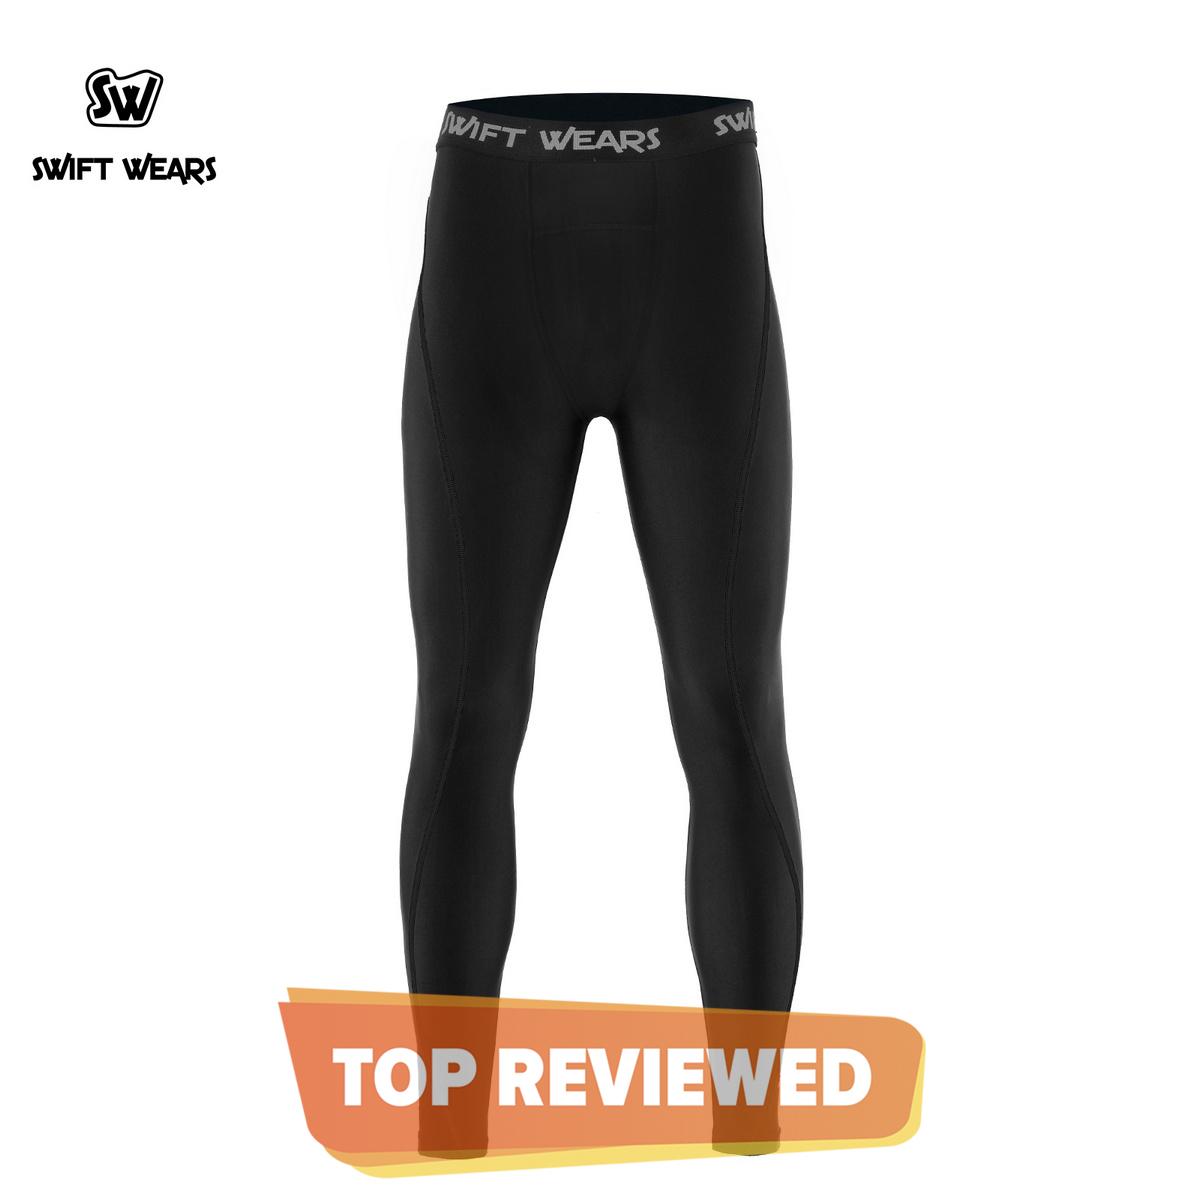 Men's Gym Fitness Yoga Compression Wear Pant Leggings